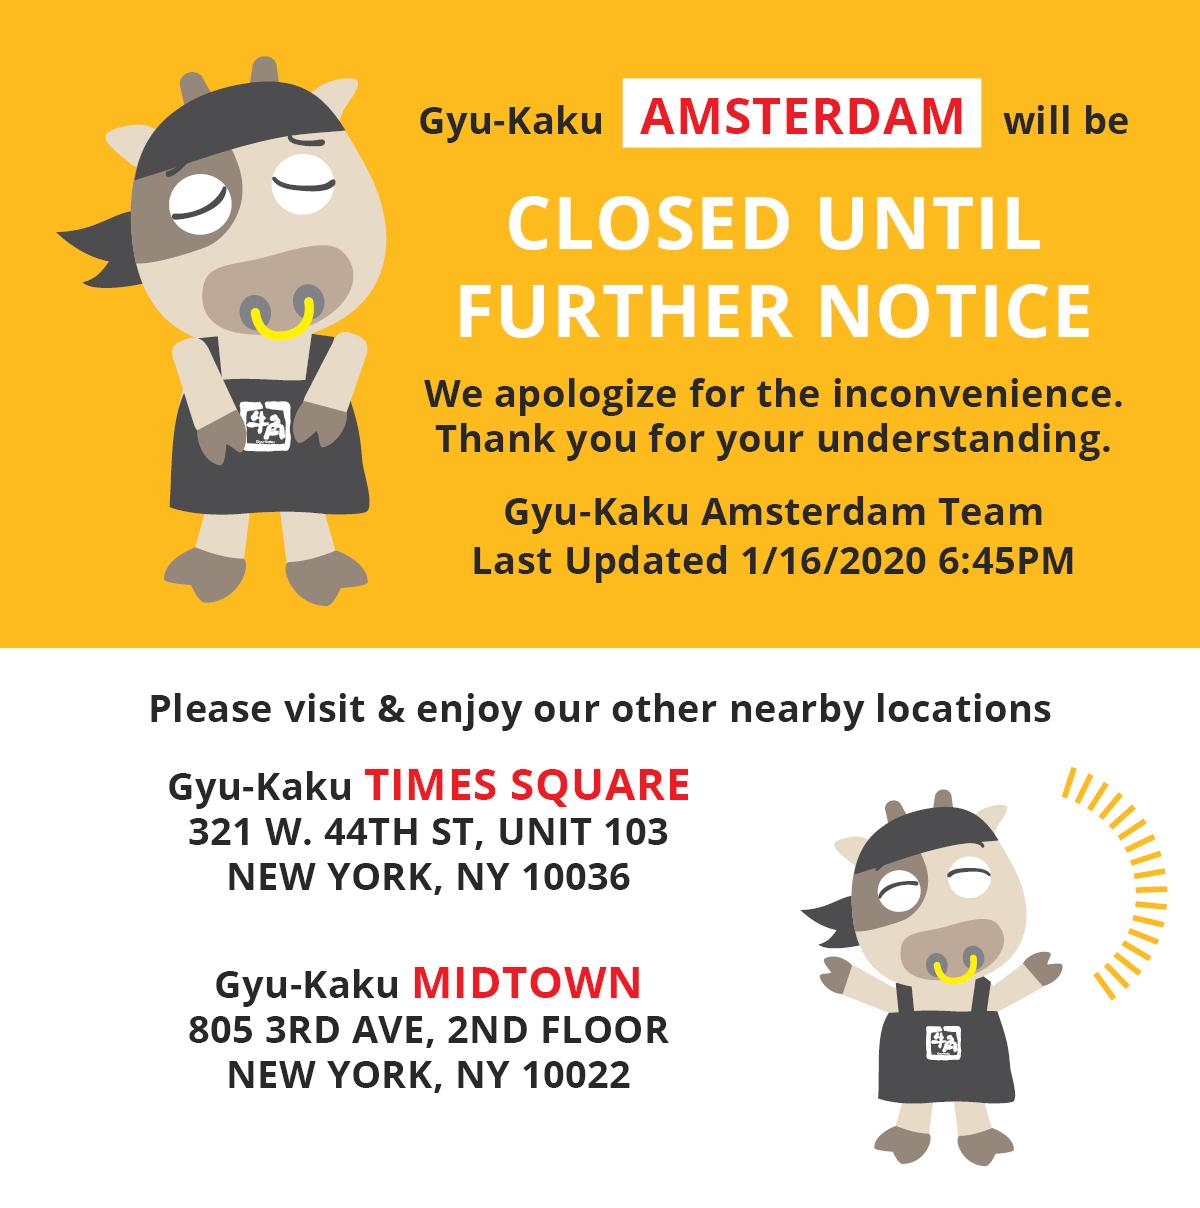 Gyu-Kaku Amsterdam Temporarily Closed